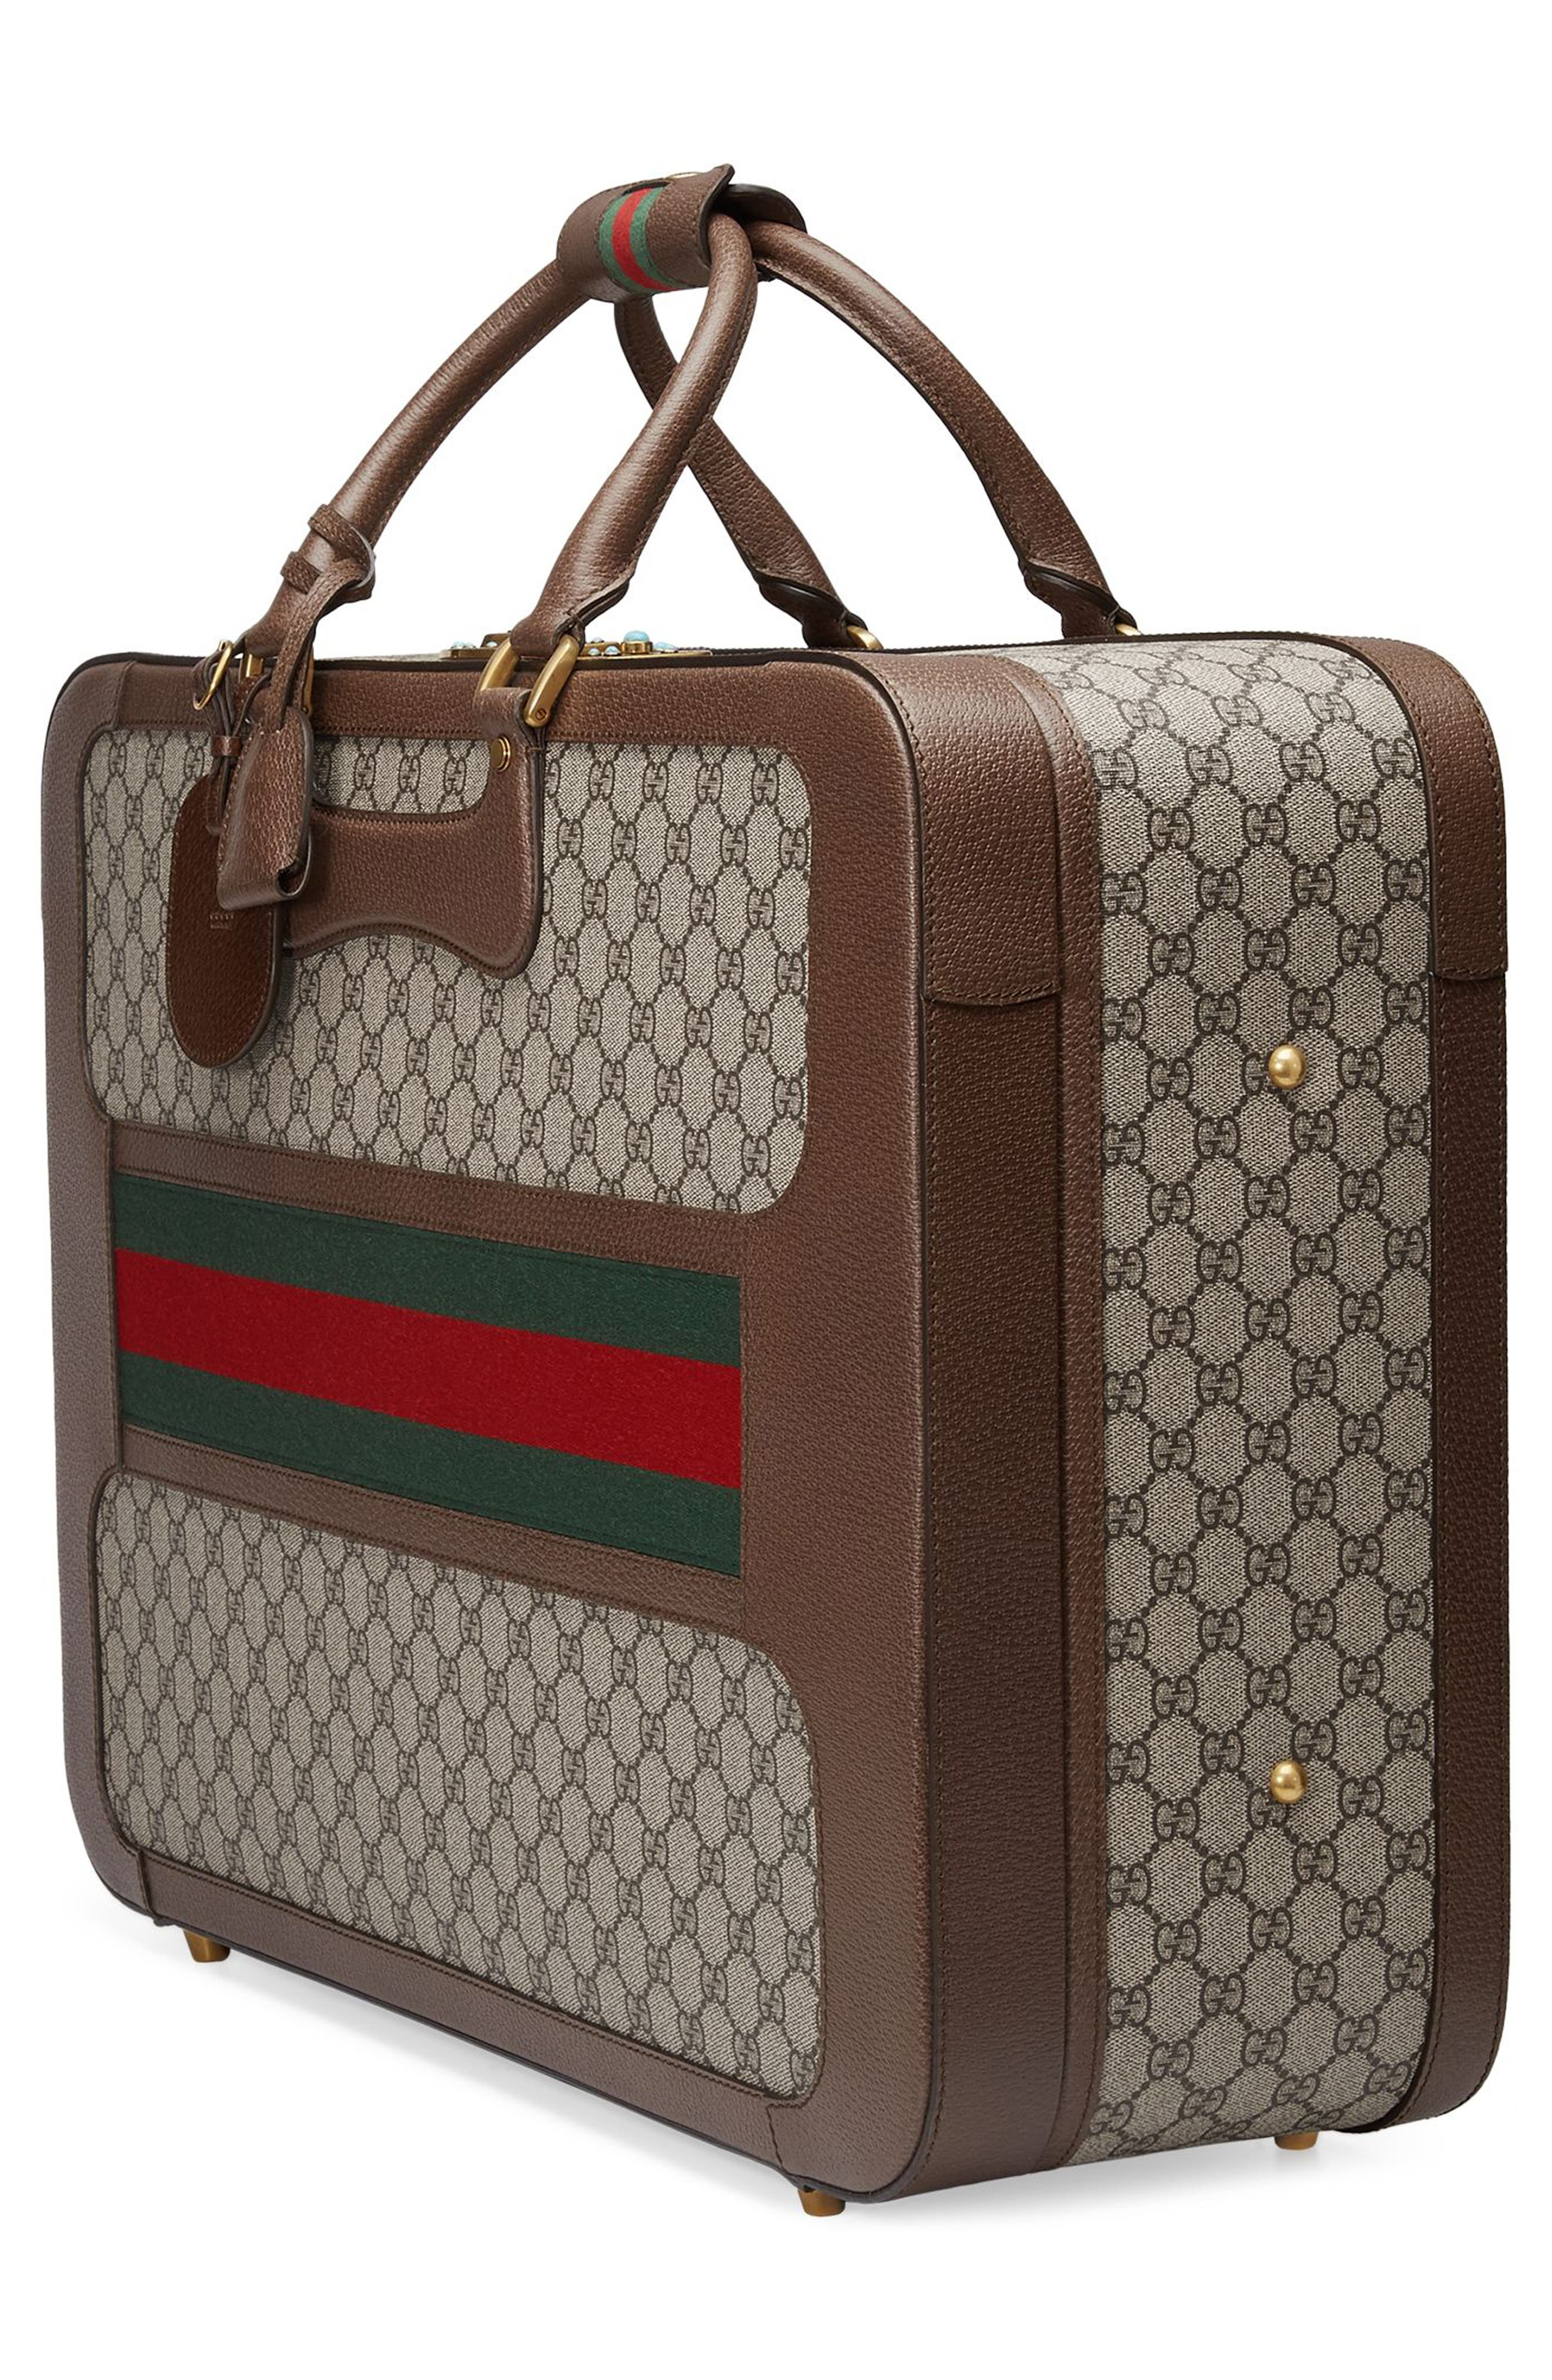 Large Echo GG Supreme Canvas & Leather Suitcase,                             Alternate thumbnail 4, color,                             283